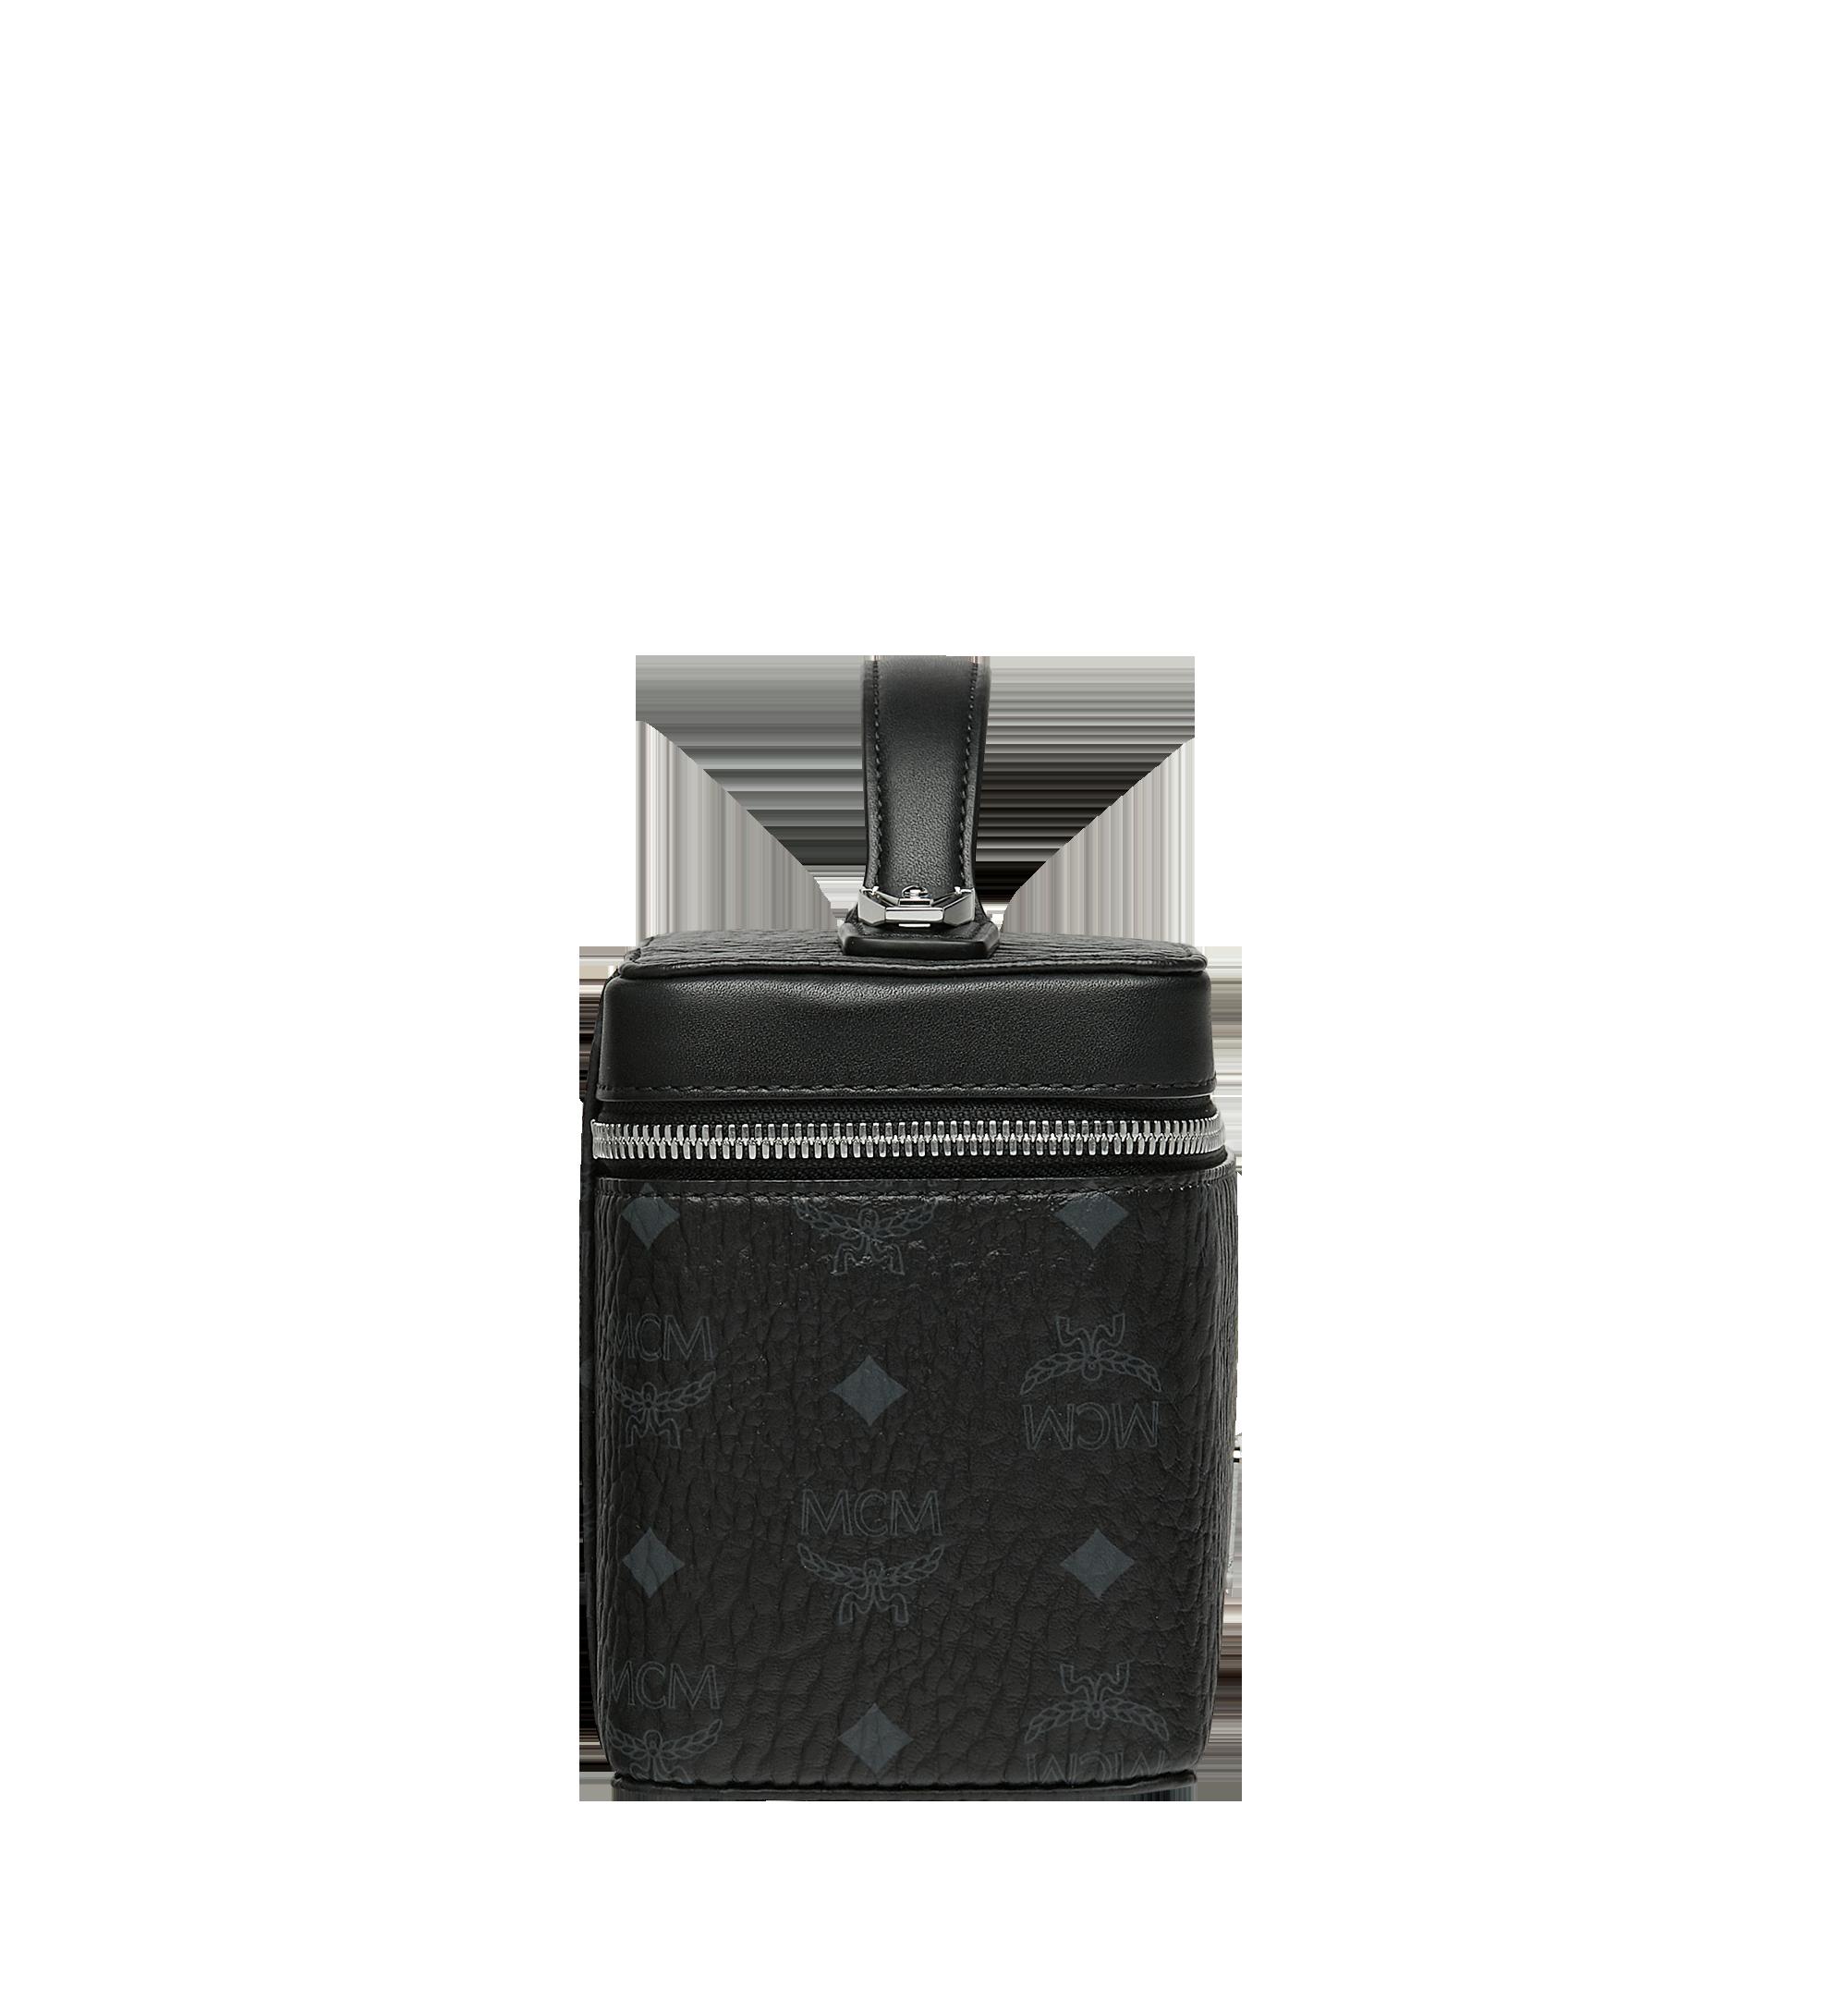 MCM Rockstar Vanity Case in Visetos Original Black MYZ9SVI95BK001 Alternate View 3